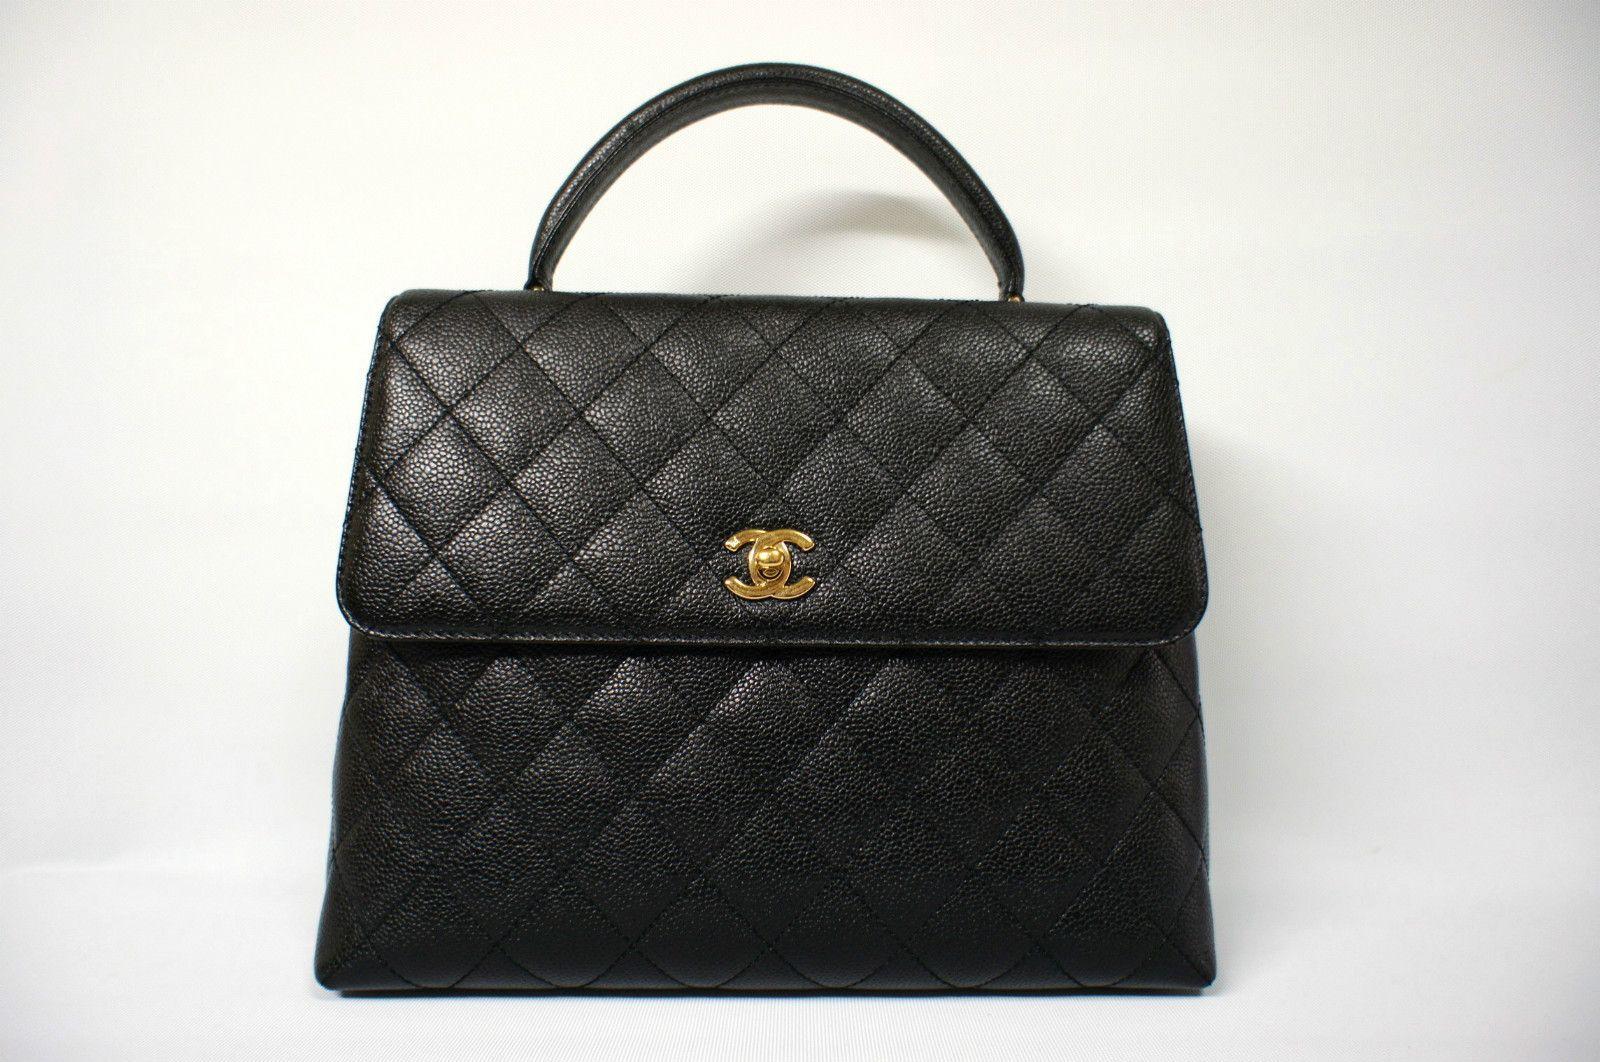 Chanel Caviar Leather Kelly Tote Executive Handbag.